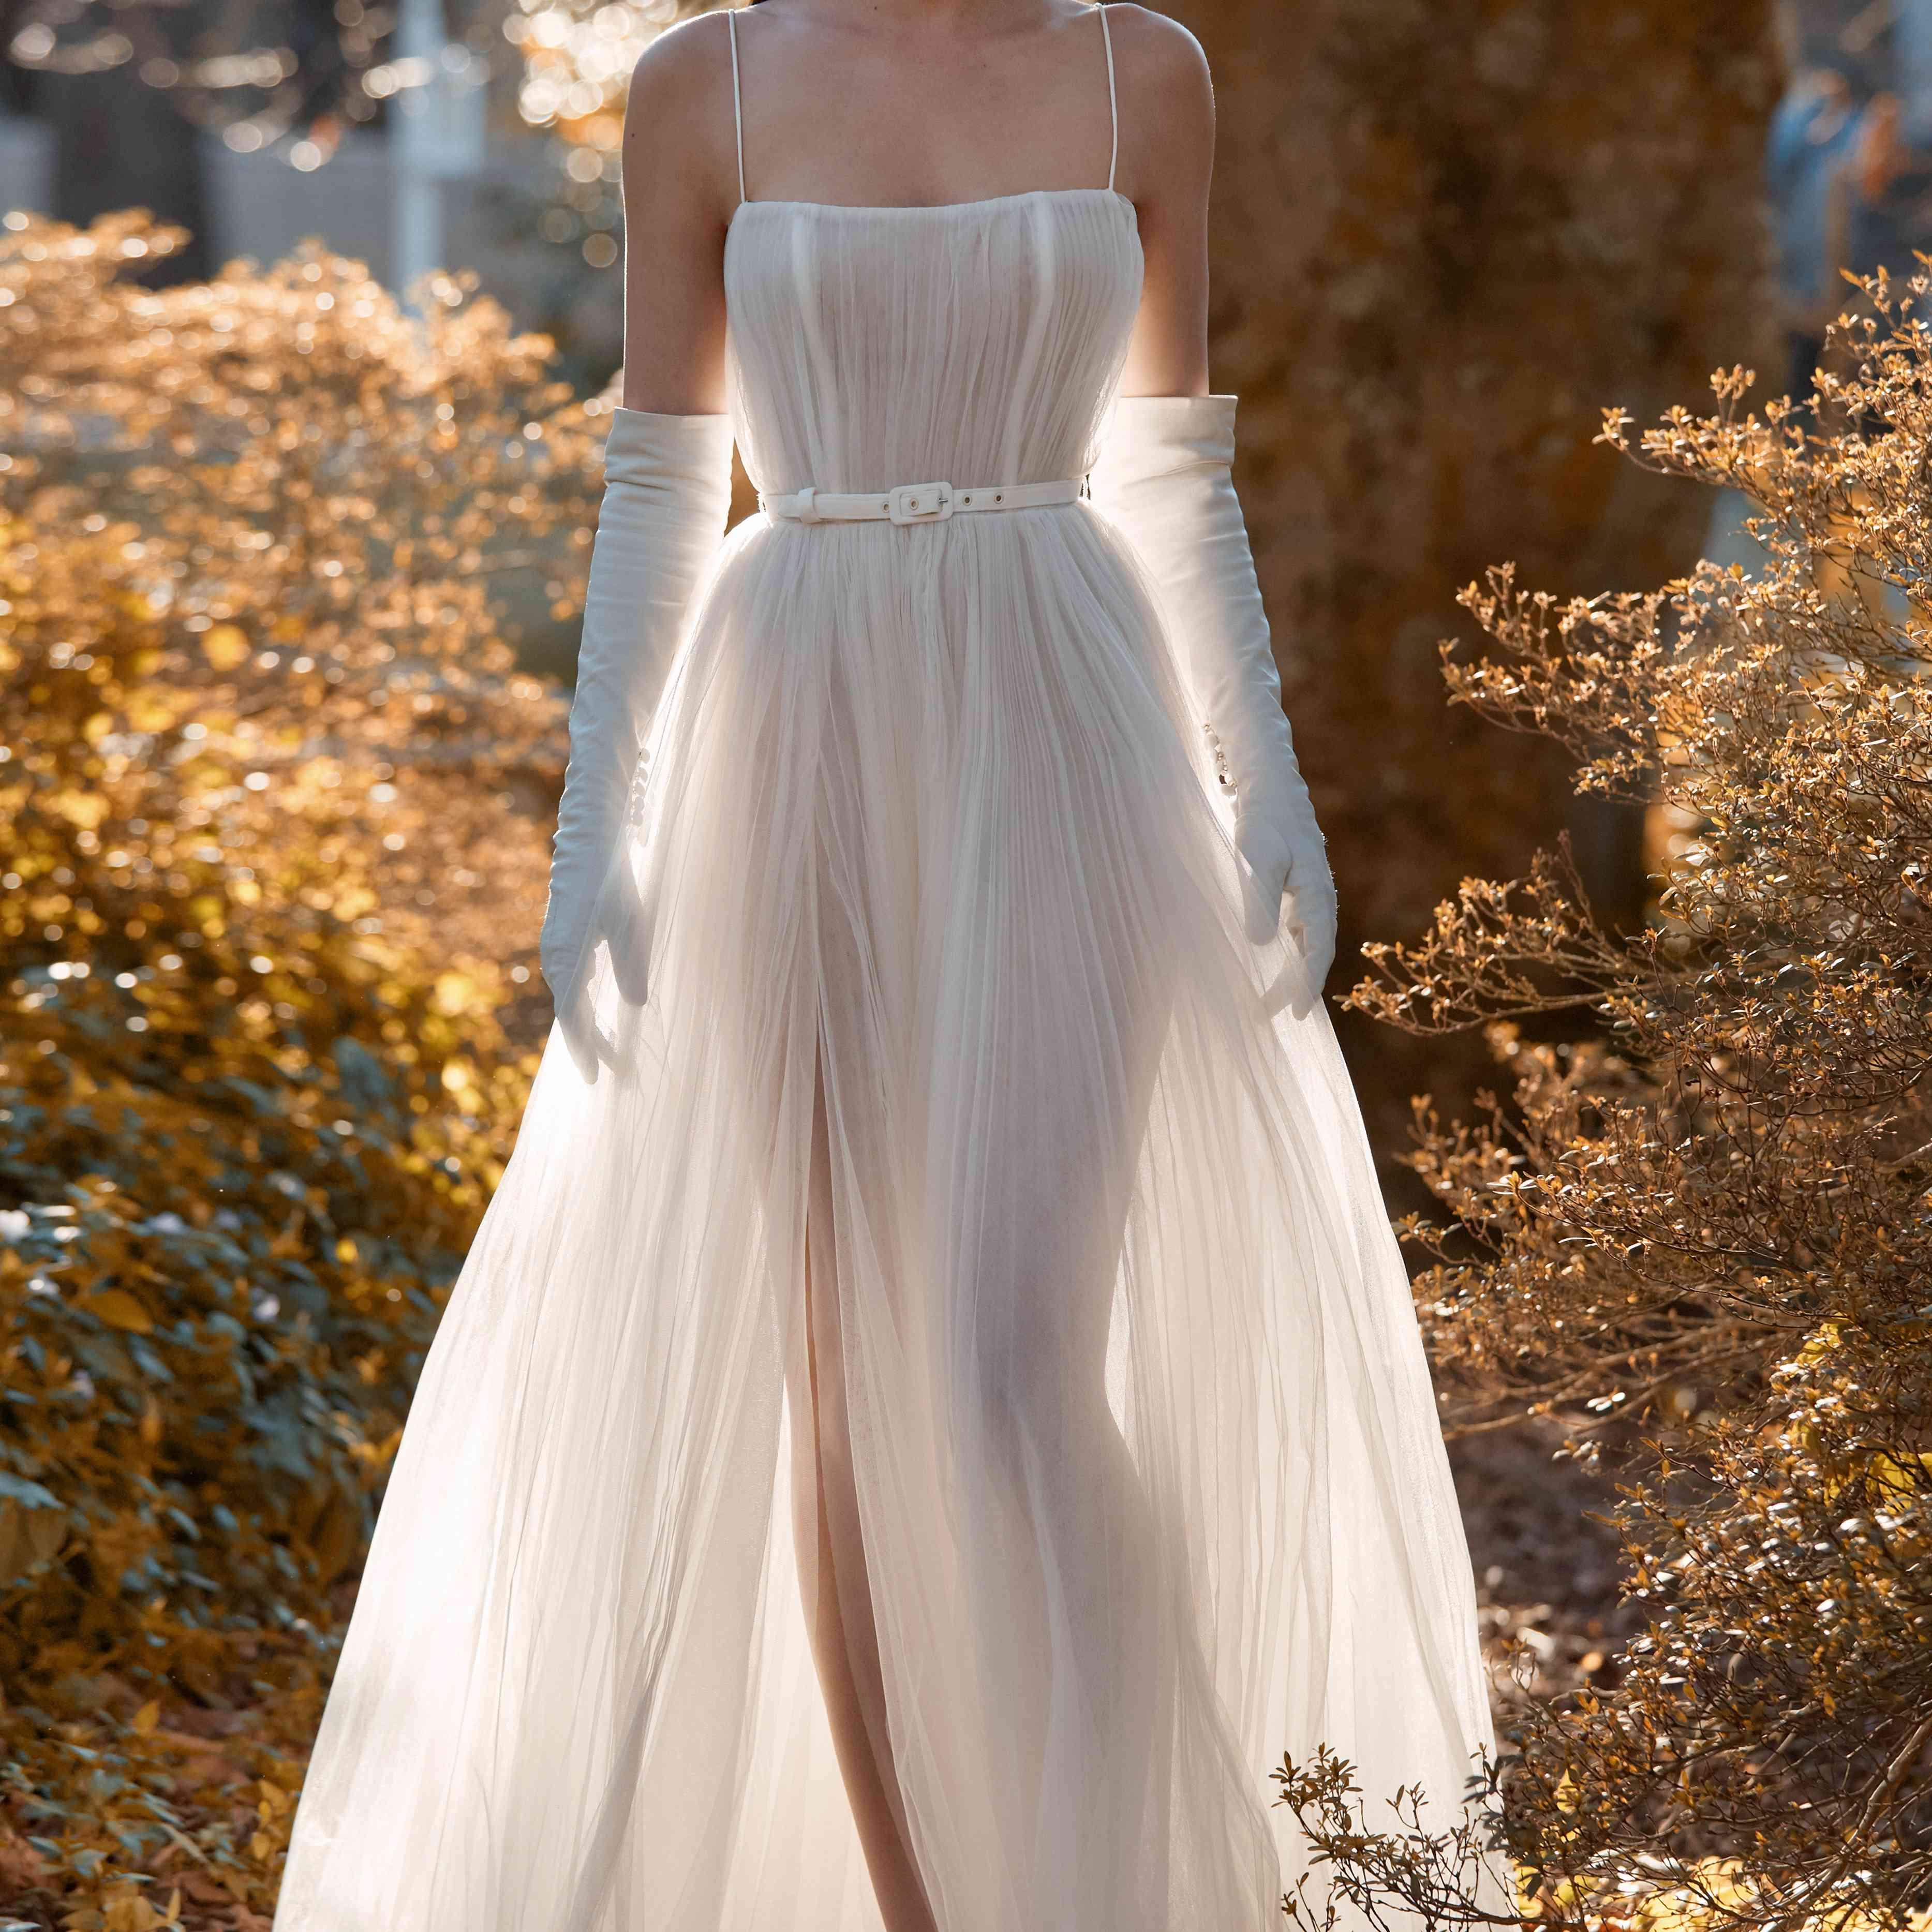 Harley wedding dress with spaghetti straps